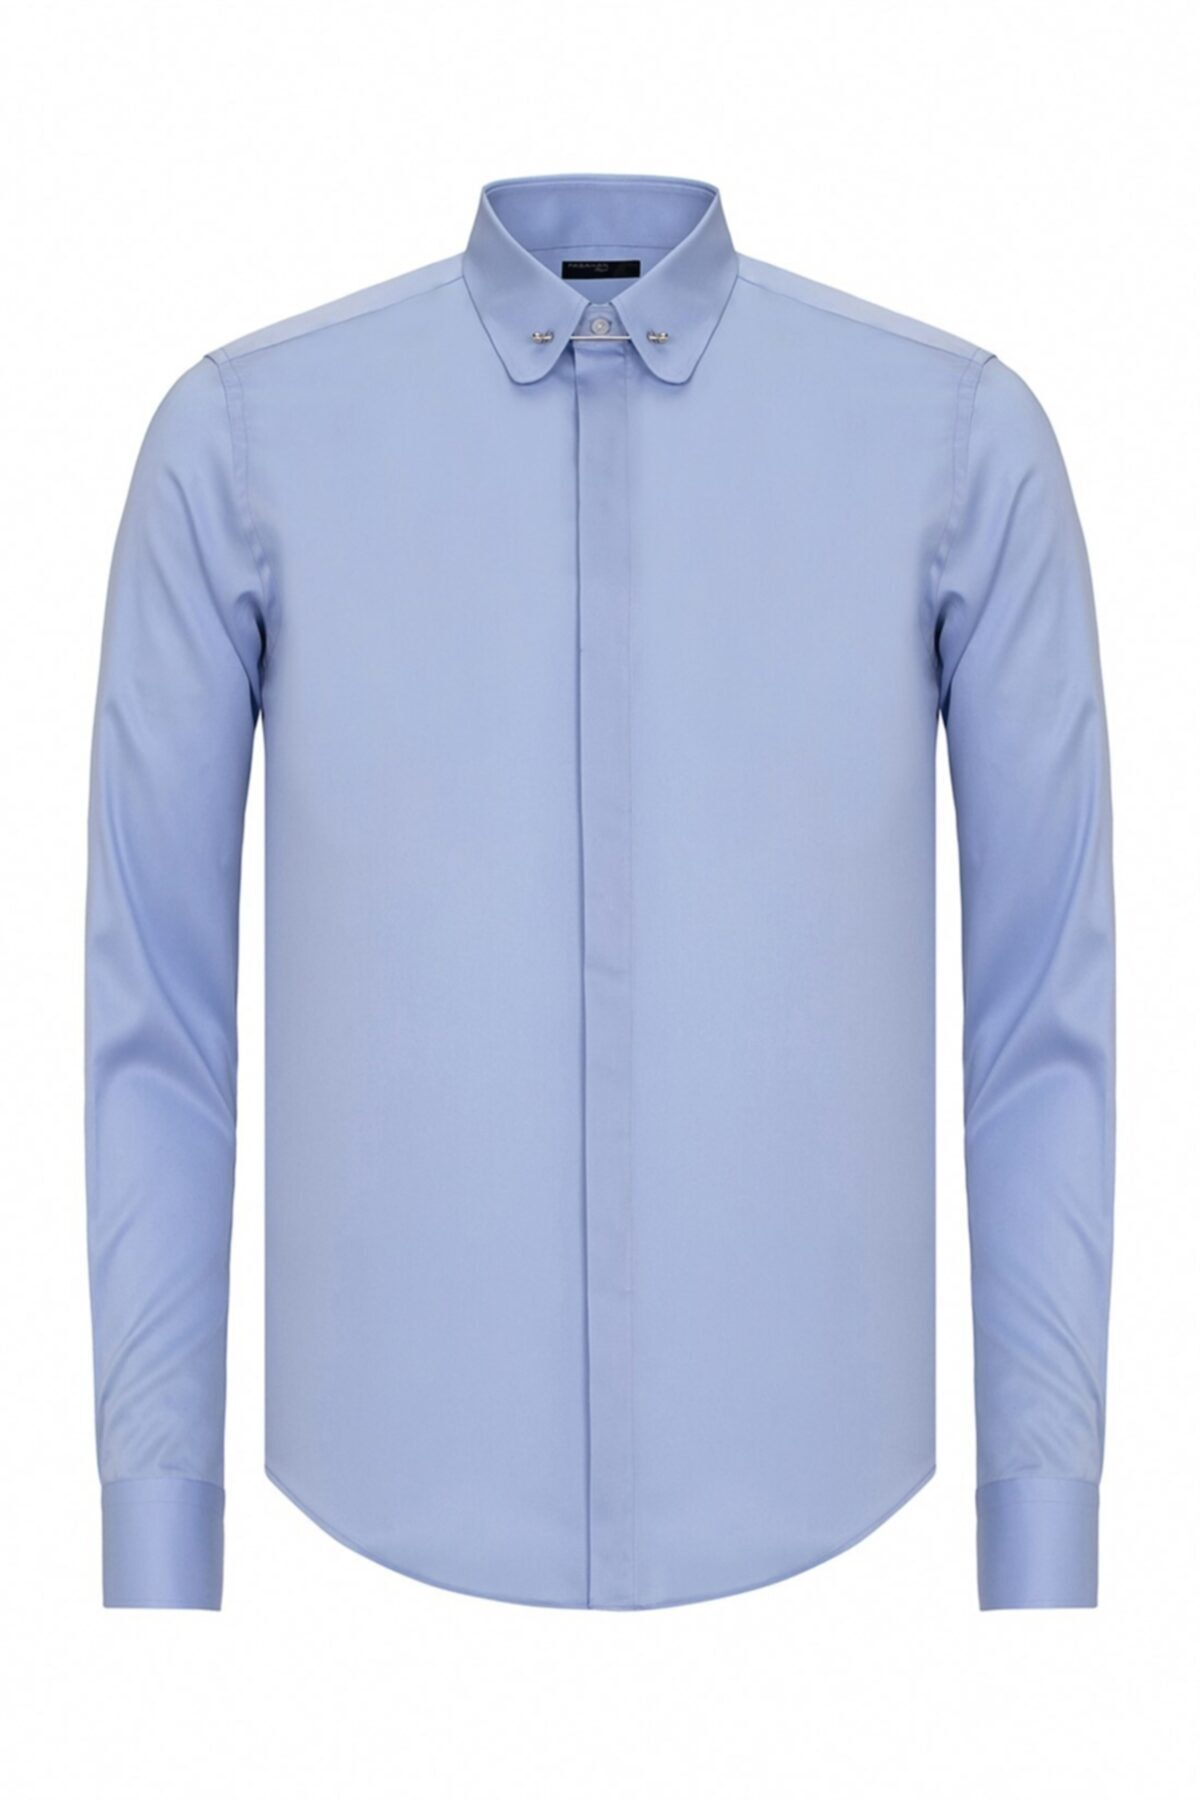 Paşahan Erkek Mavi Slim Fit Bebe Yaka İğneli Gömlek 1